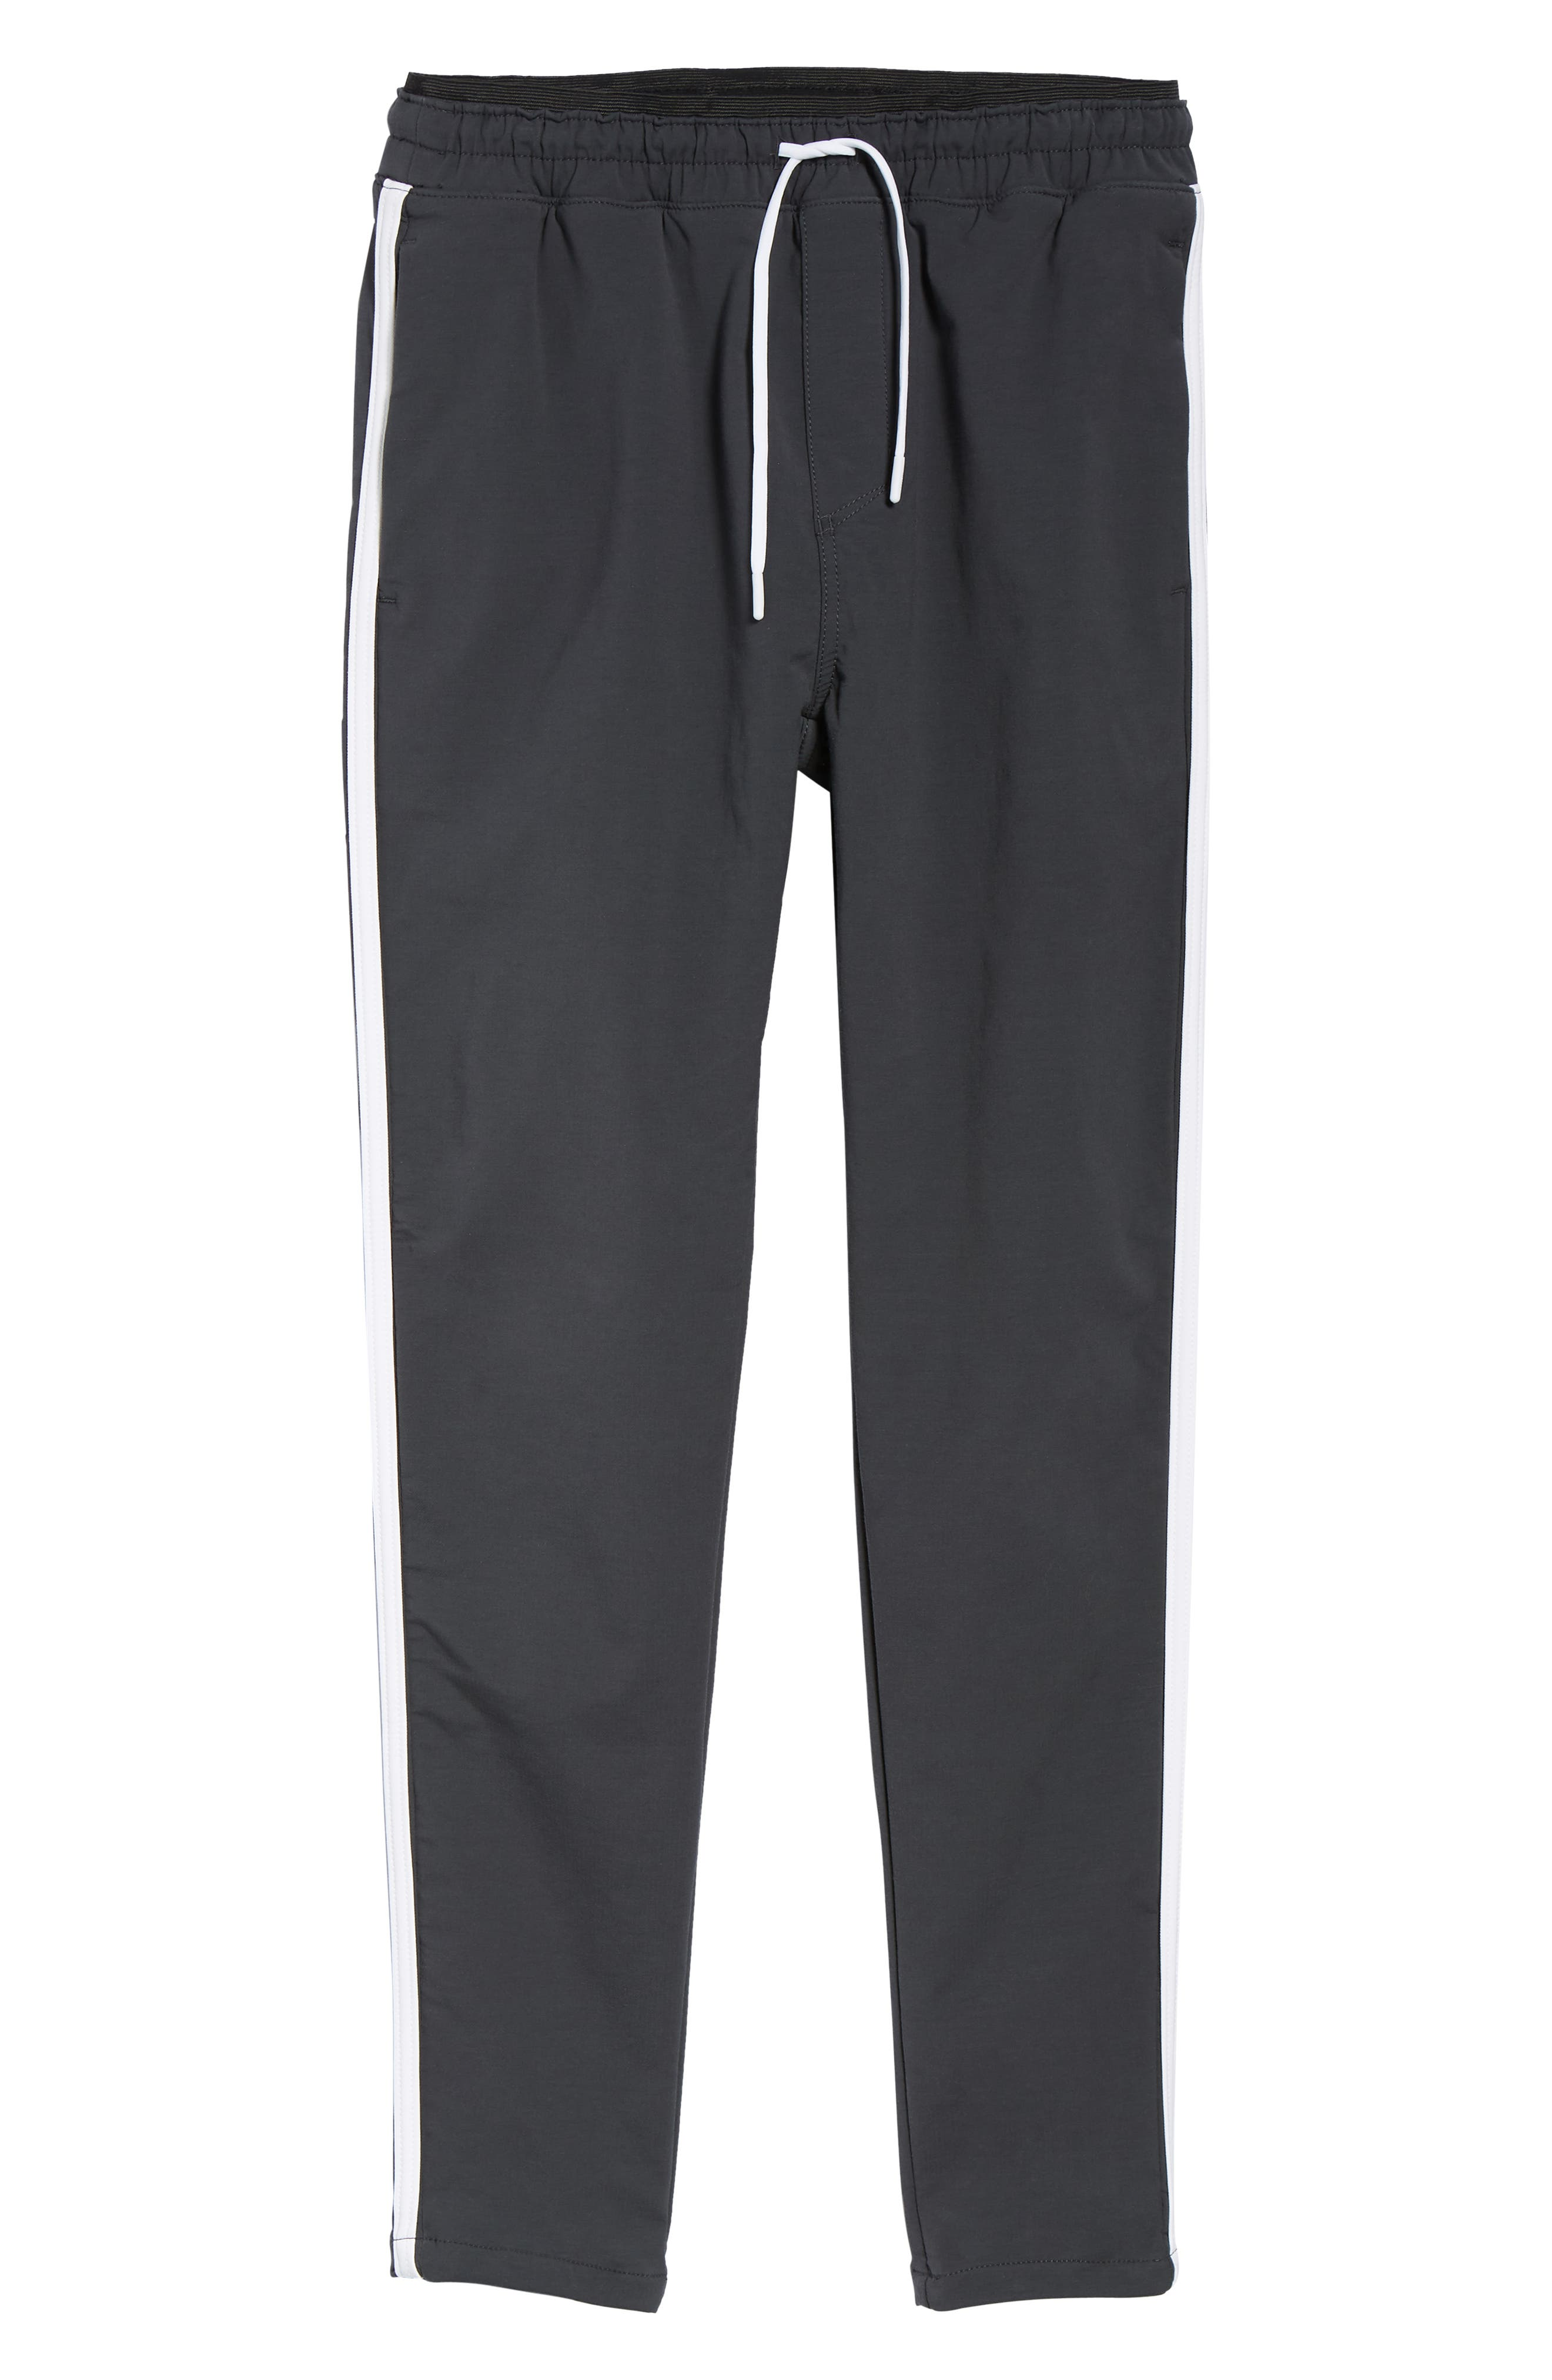 Jumpshot Slim Track Pants,                             Alternate thumbnail 6, color,                             VINTAGE BLACK